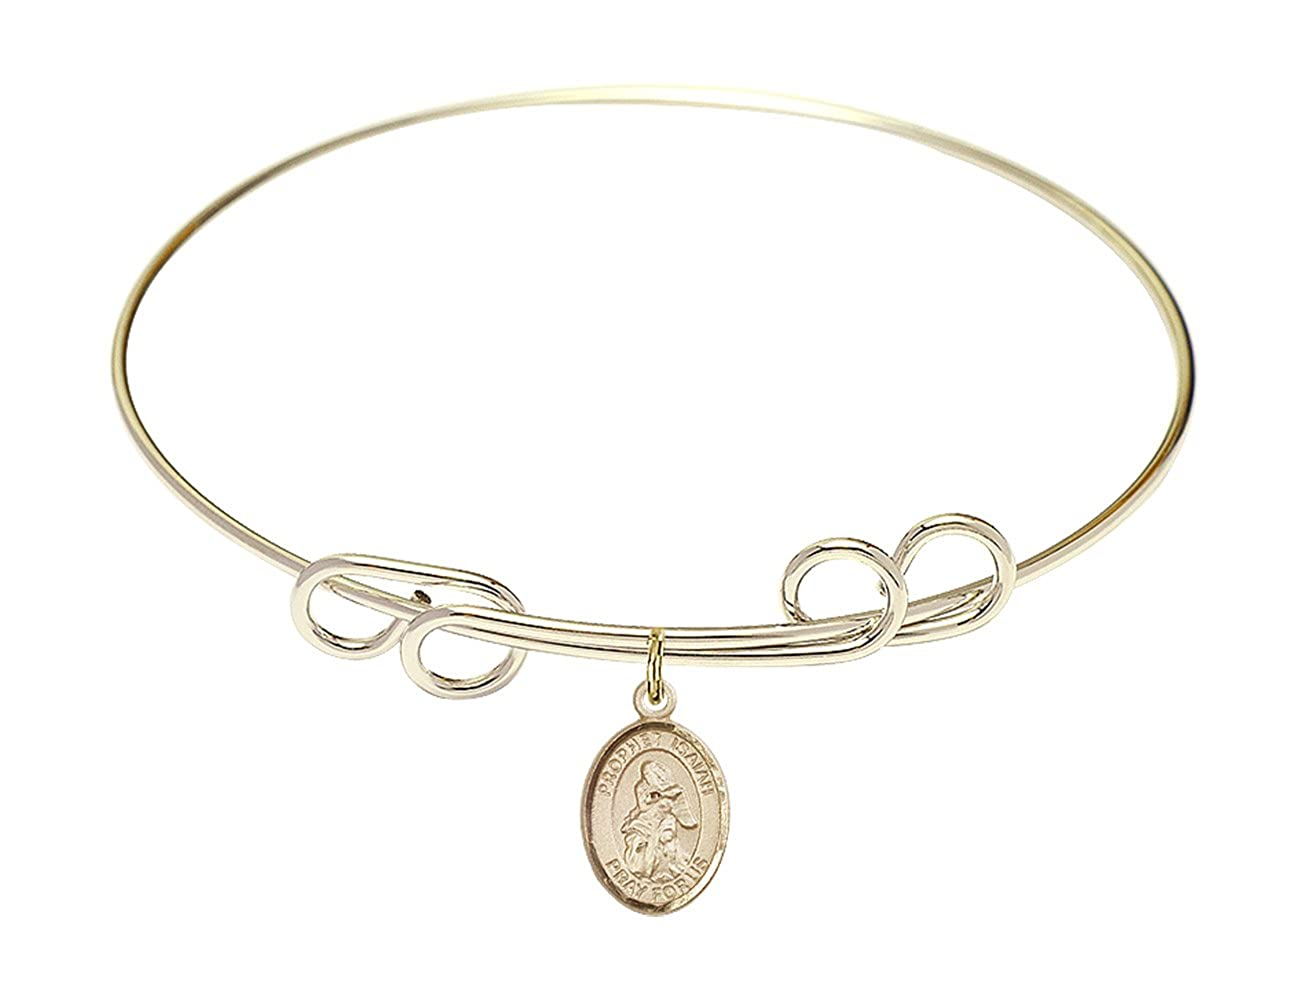 Isaiah Charm. DiamondJewelryNY Double Loop Bangle Bracelet with a St